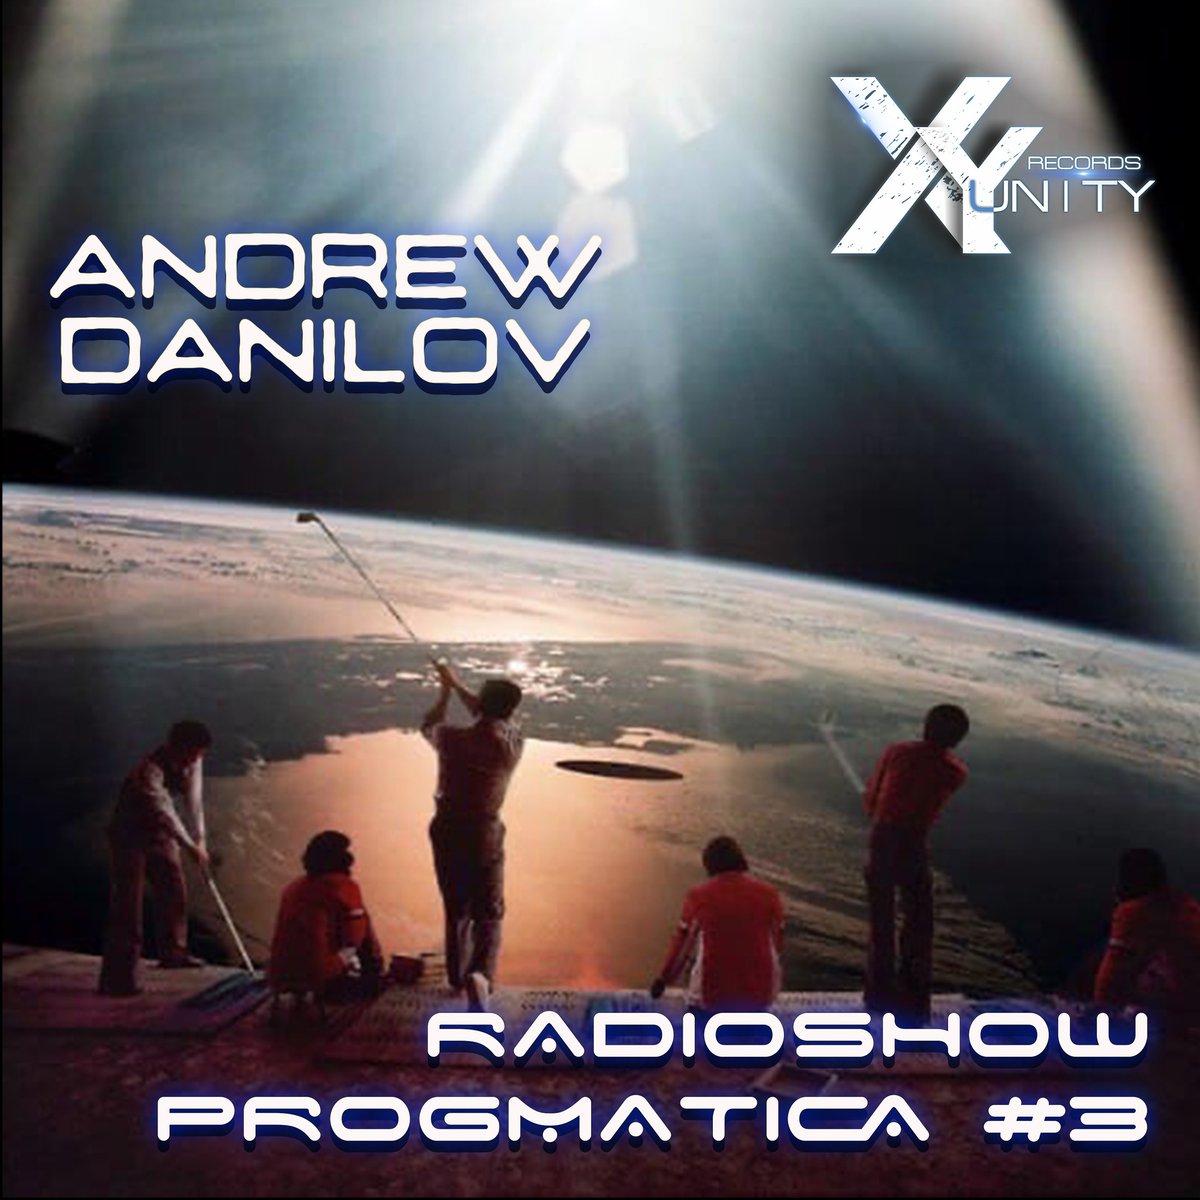 XY-unity Andrew Danilov - Radioshow Progmatica #3 #mixesDeepTechno   http:// promodj.com/download/69358 84/XY-unity%20Andrew%20Danilov%20-%20Radioshow%20Progmatica%20%233%20%28promodj.com%29.mp3?podcast  …  via @PodcastAddict<br>http://pic.twitter.com/7G1AxJvLww